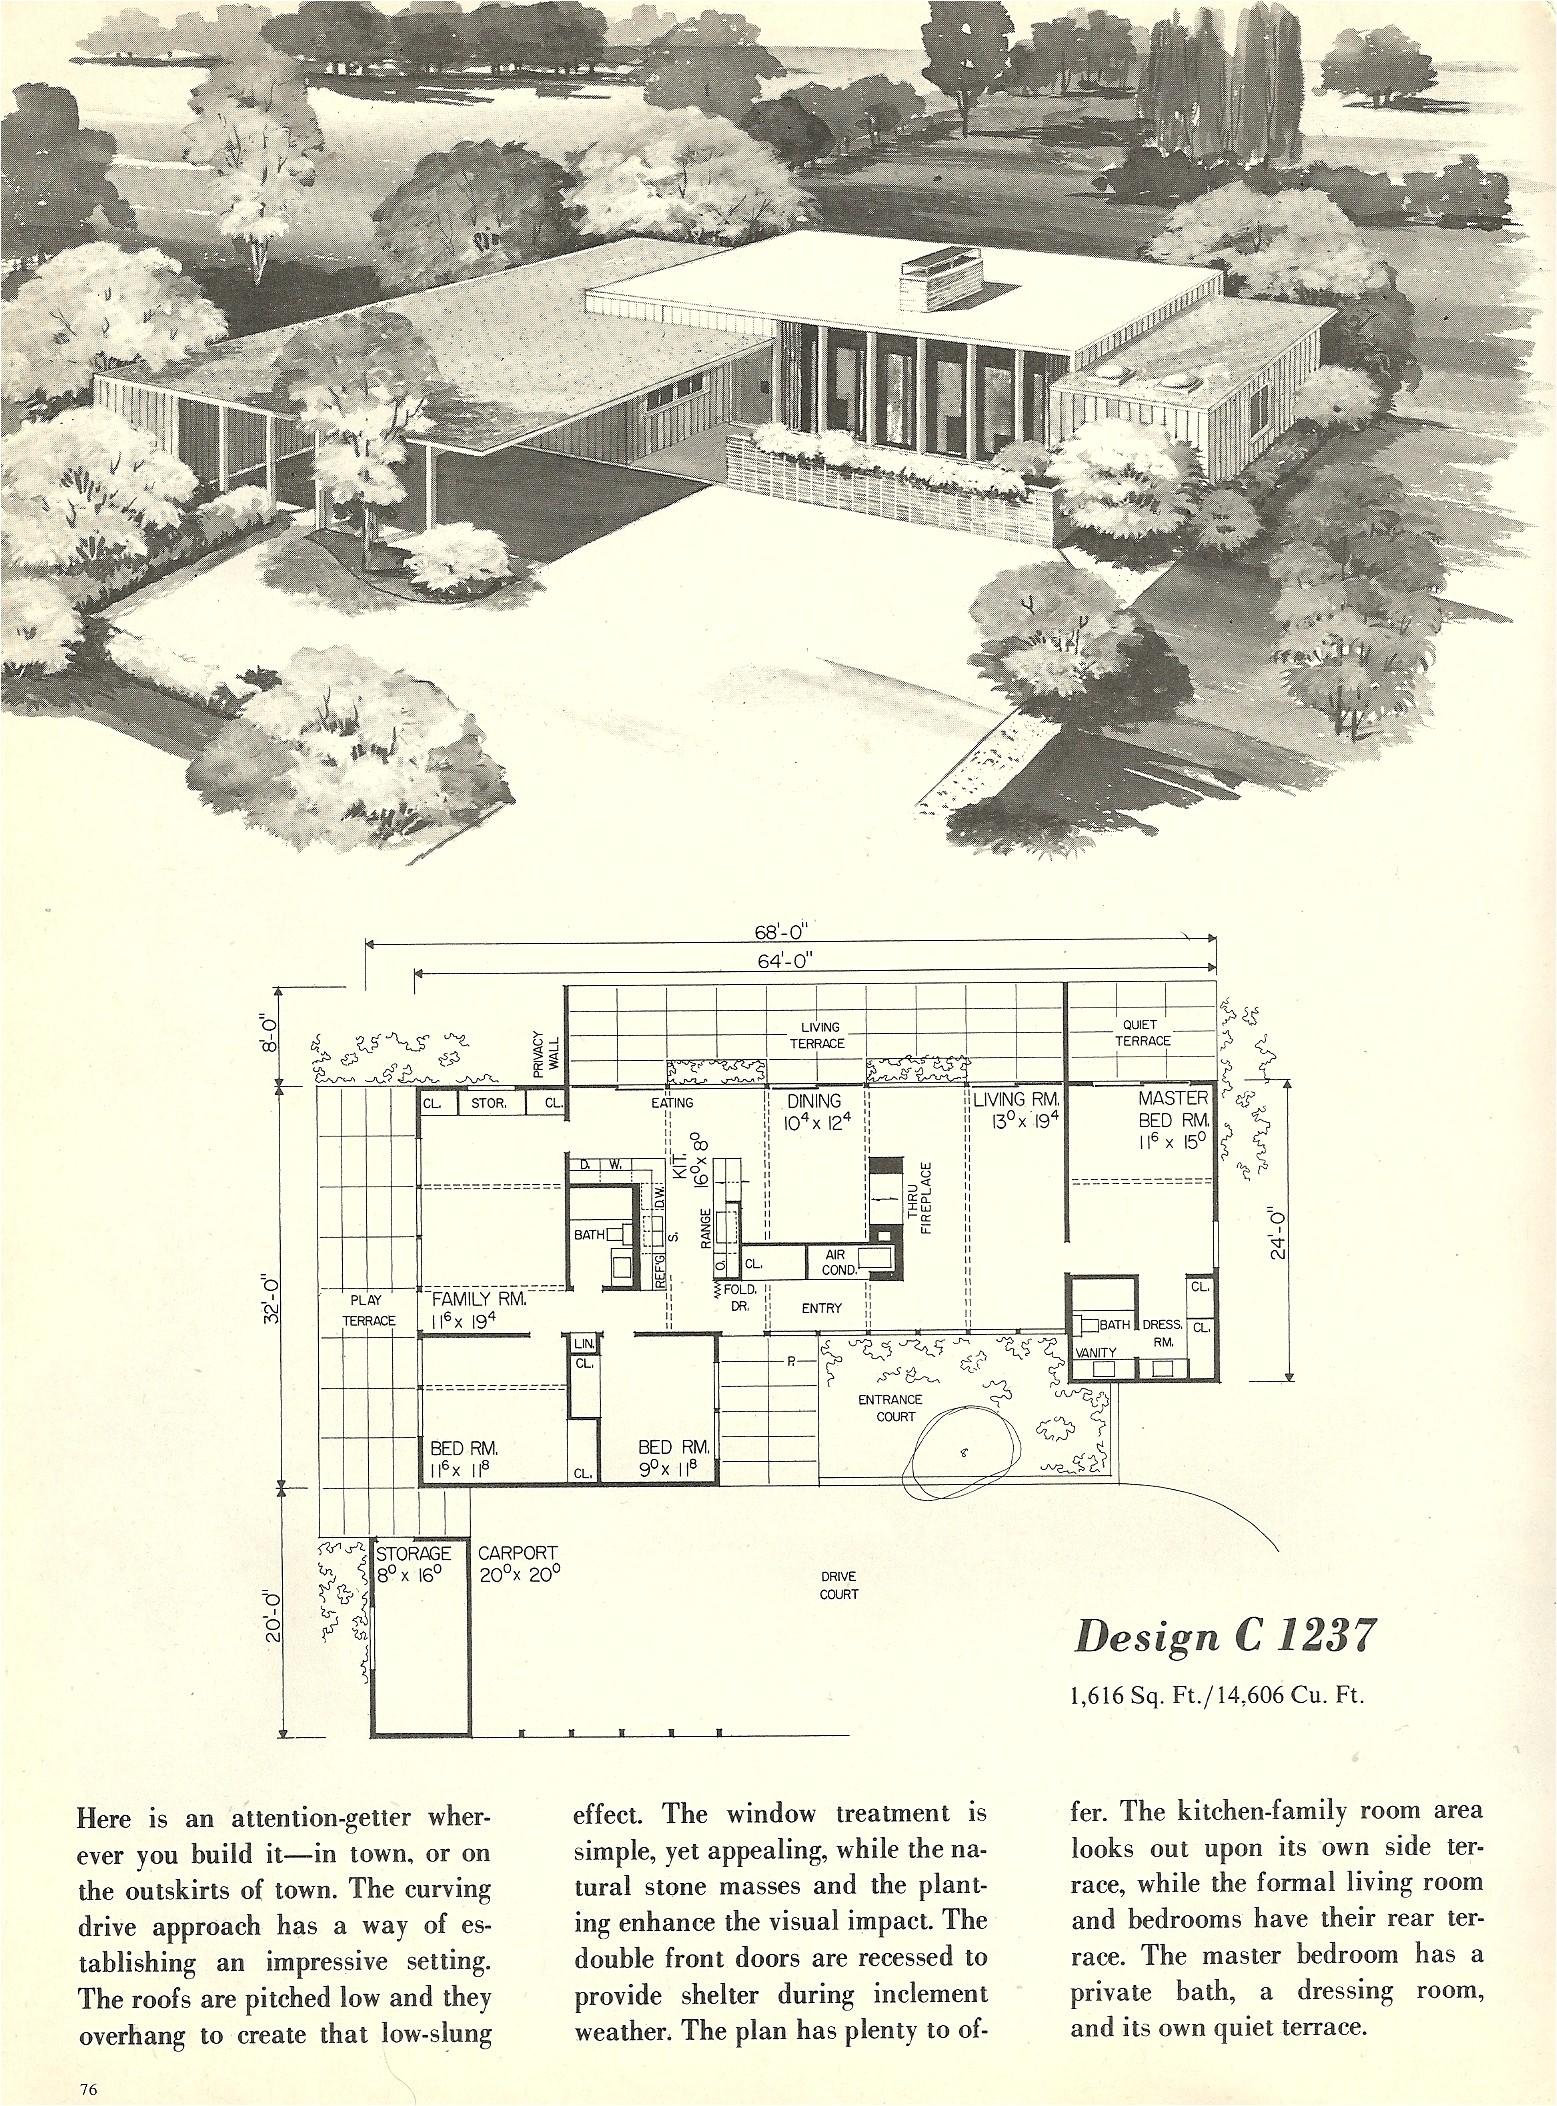 vintage house plans 1237